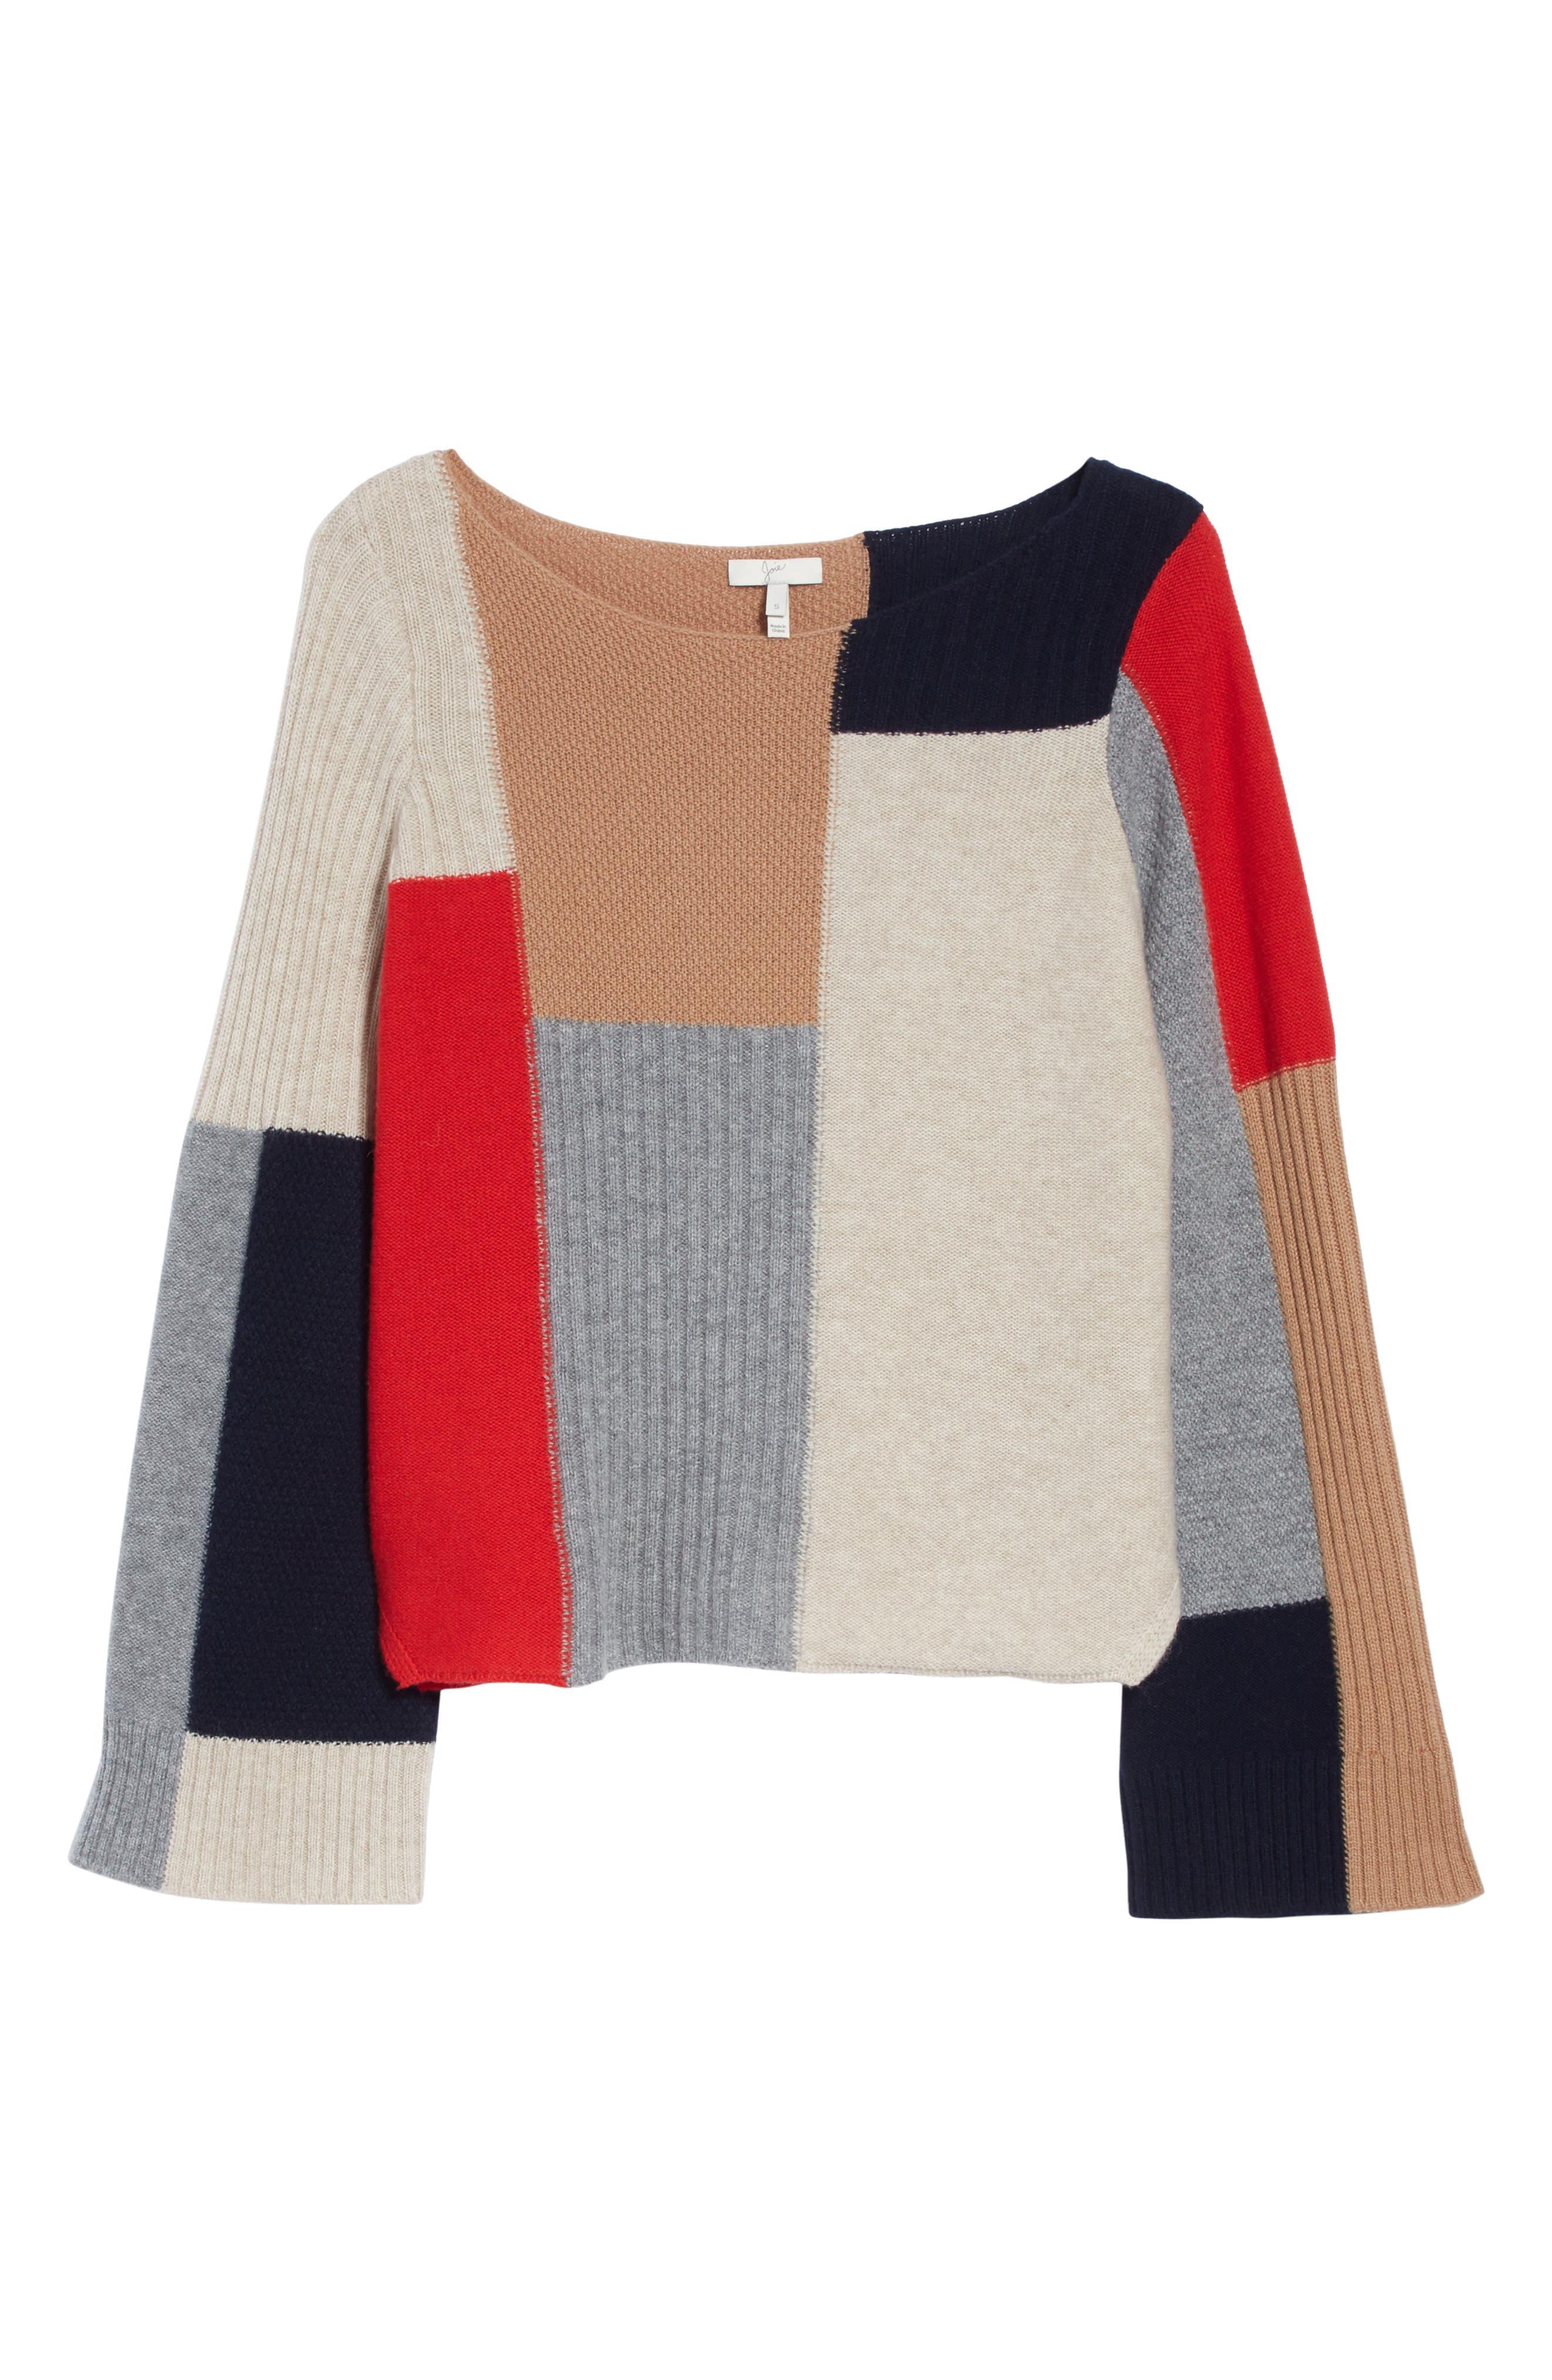 Adene Wool & Cashmere Sweater,                             Alternate thumbnail 6, color,                             641